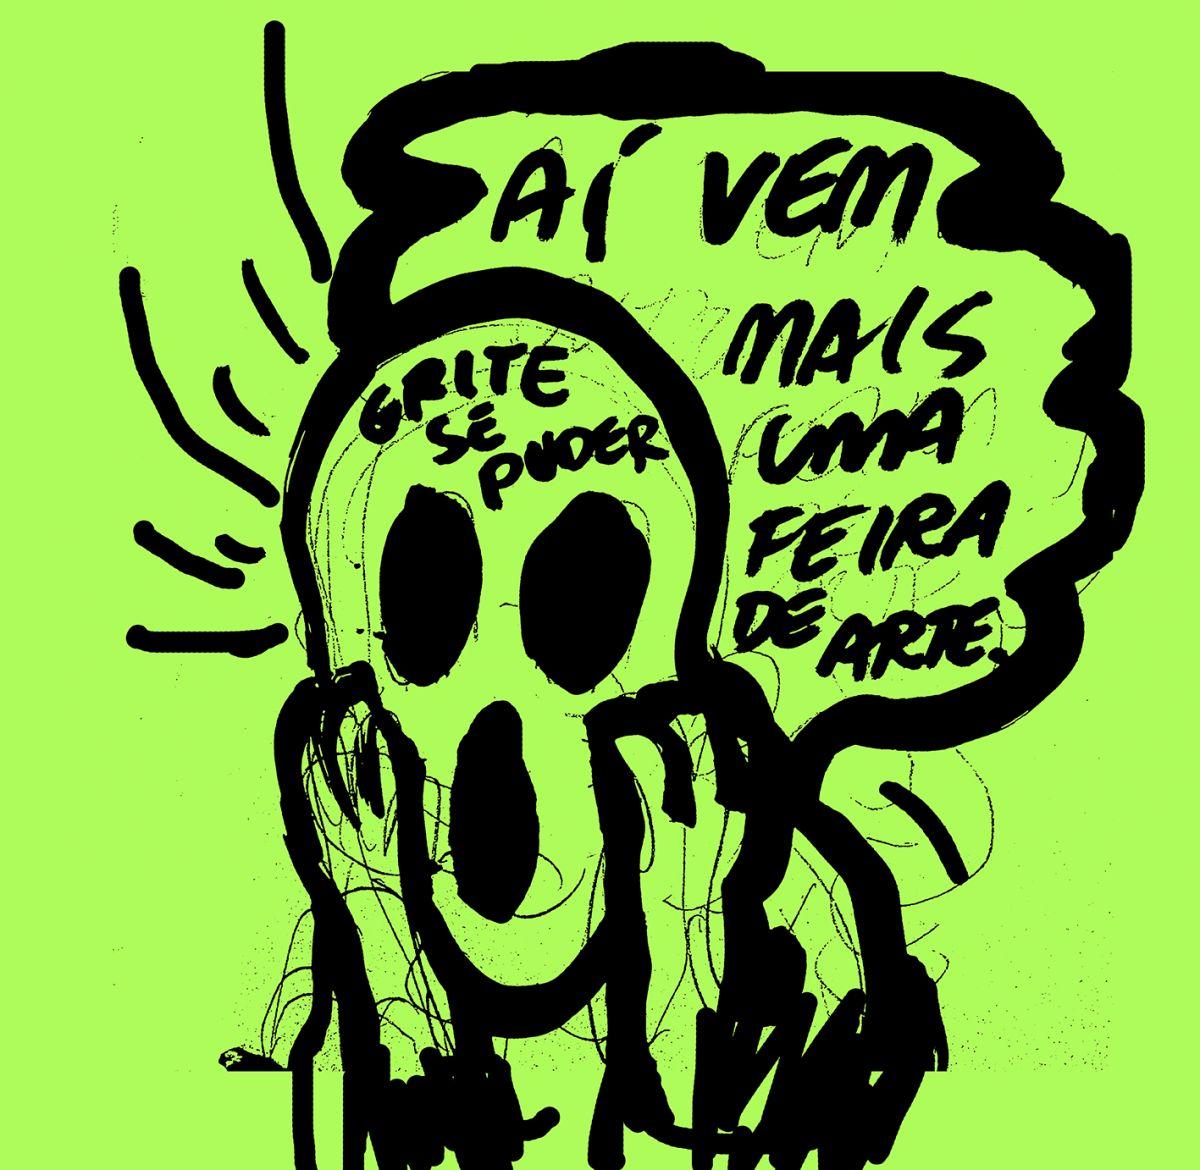 Desenho de Alvaro Seixas (Foto: Cortesia do artista)